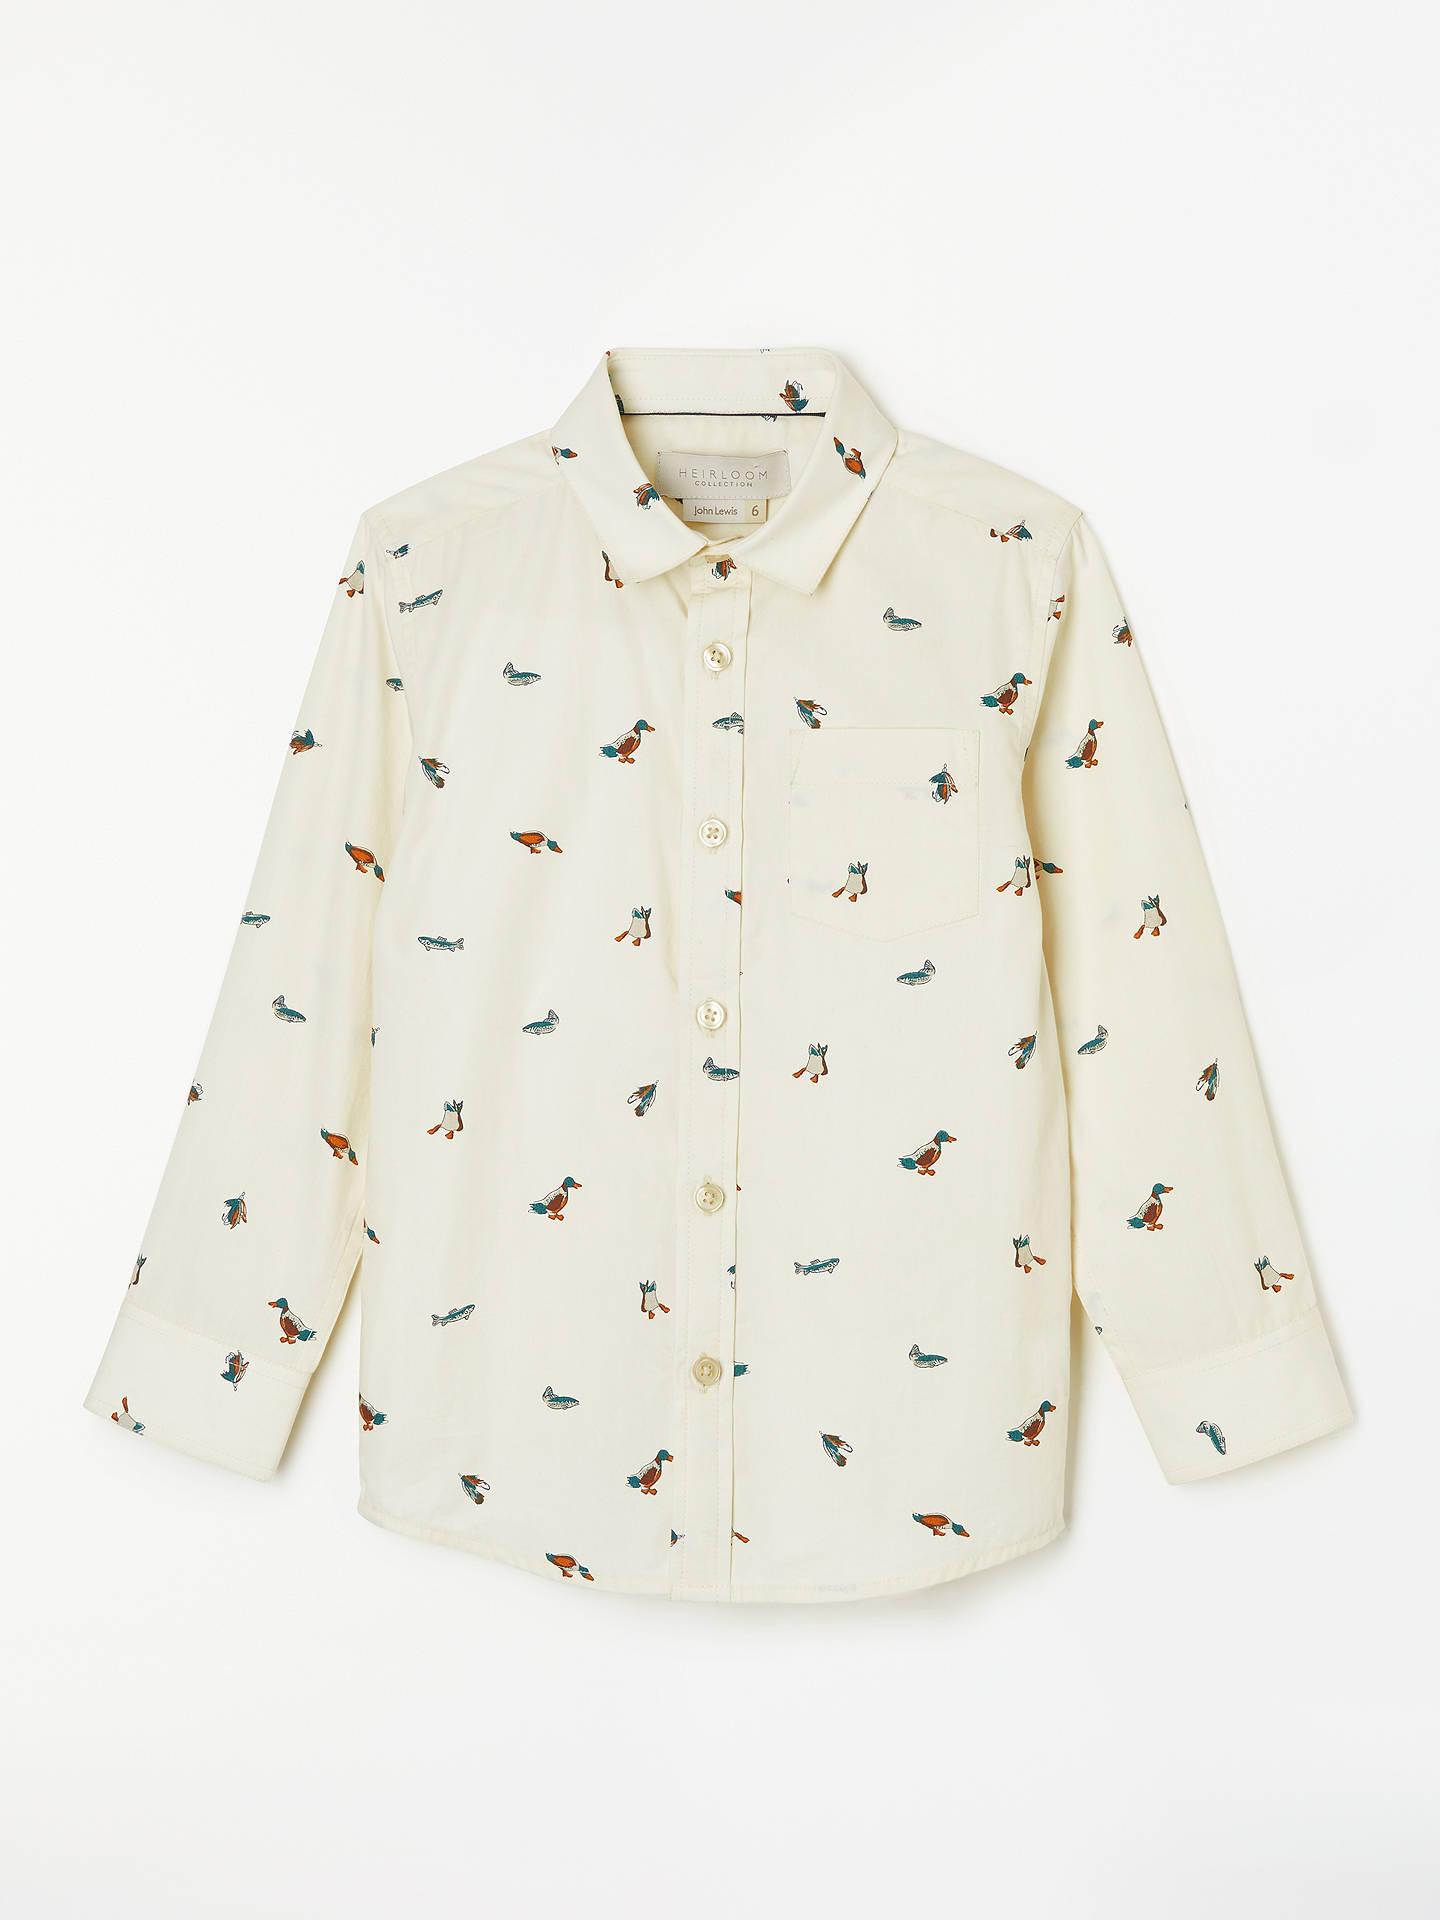 9f61fe52c Buy John Lewis & Partners Heirloom Collection Boys' Duck Shirt,  Cream/Multi, ...